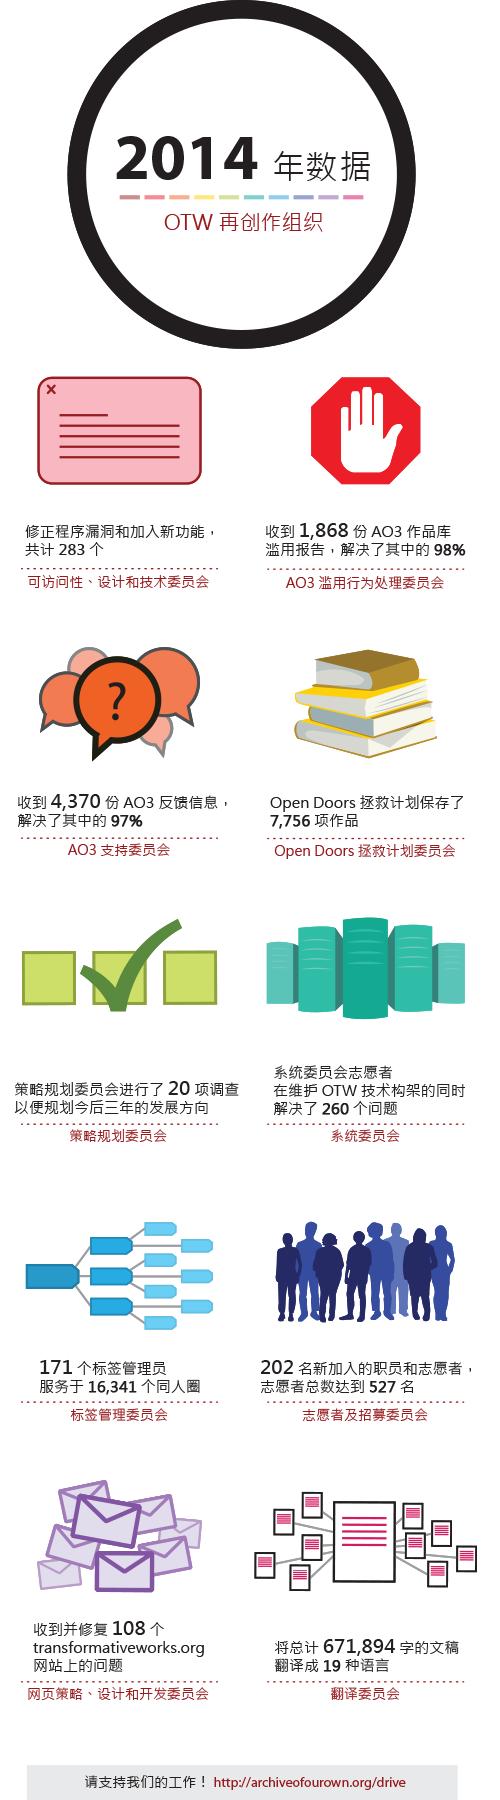 OTW 再创作组织 2014 年数据。可访问性、设计和技术委员会:修正程序漏洞和加入新功能,共计 283 个。AO3 滥用行为处理委员会:收到 1,868 份 AO3(AO3 作品库)滥用报告,解决了其中的 98%。AO3 支持委员会:收到 4,370 份 AO3 反馈信息,解决了其中的 97%。Open Doors 拯救计划委员会:保存了 7,756 项作品。策略规划委员会:进行了 20 项调查以便规划今后三年的发展方向。系统委员会:志愿者在维护 OTW 技术构架的同时解决了 260 个问题。标签管理委员会:171 个标签管理员服务于 16,341 个同人圈。志愿者及招募委员会:202 名新加入的职员和志愿者,志愿者总数达到 527 名。网页策略、设计和开发委员会:收到并修复 108 个 transformativeworks.org 网站上的问题。翻译委员会:将总计 671,894 字的文稿翻译成 19 种语言。请支持我们的工作 archiveofourown.org/drive